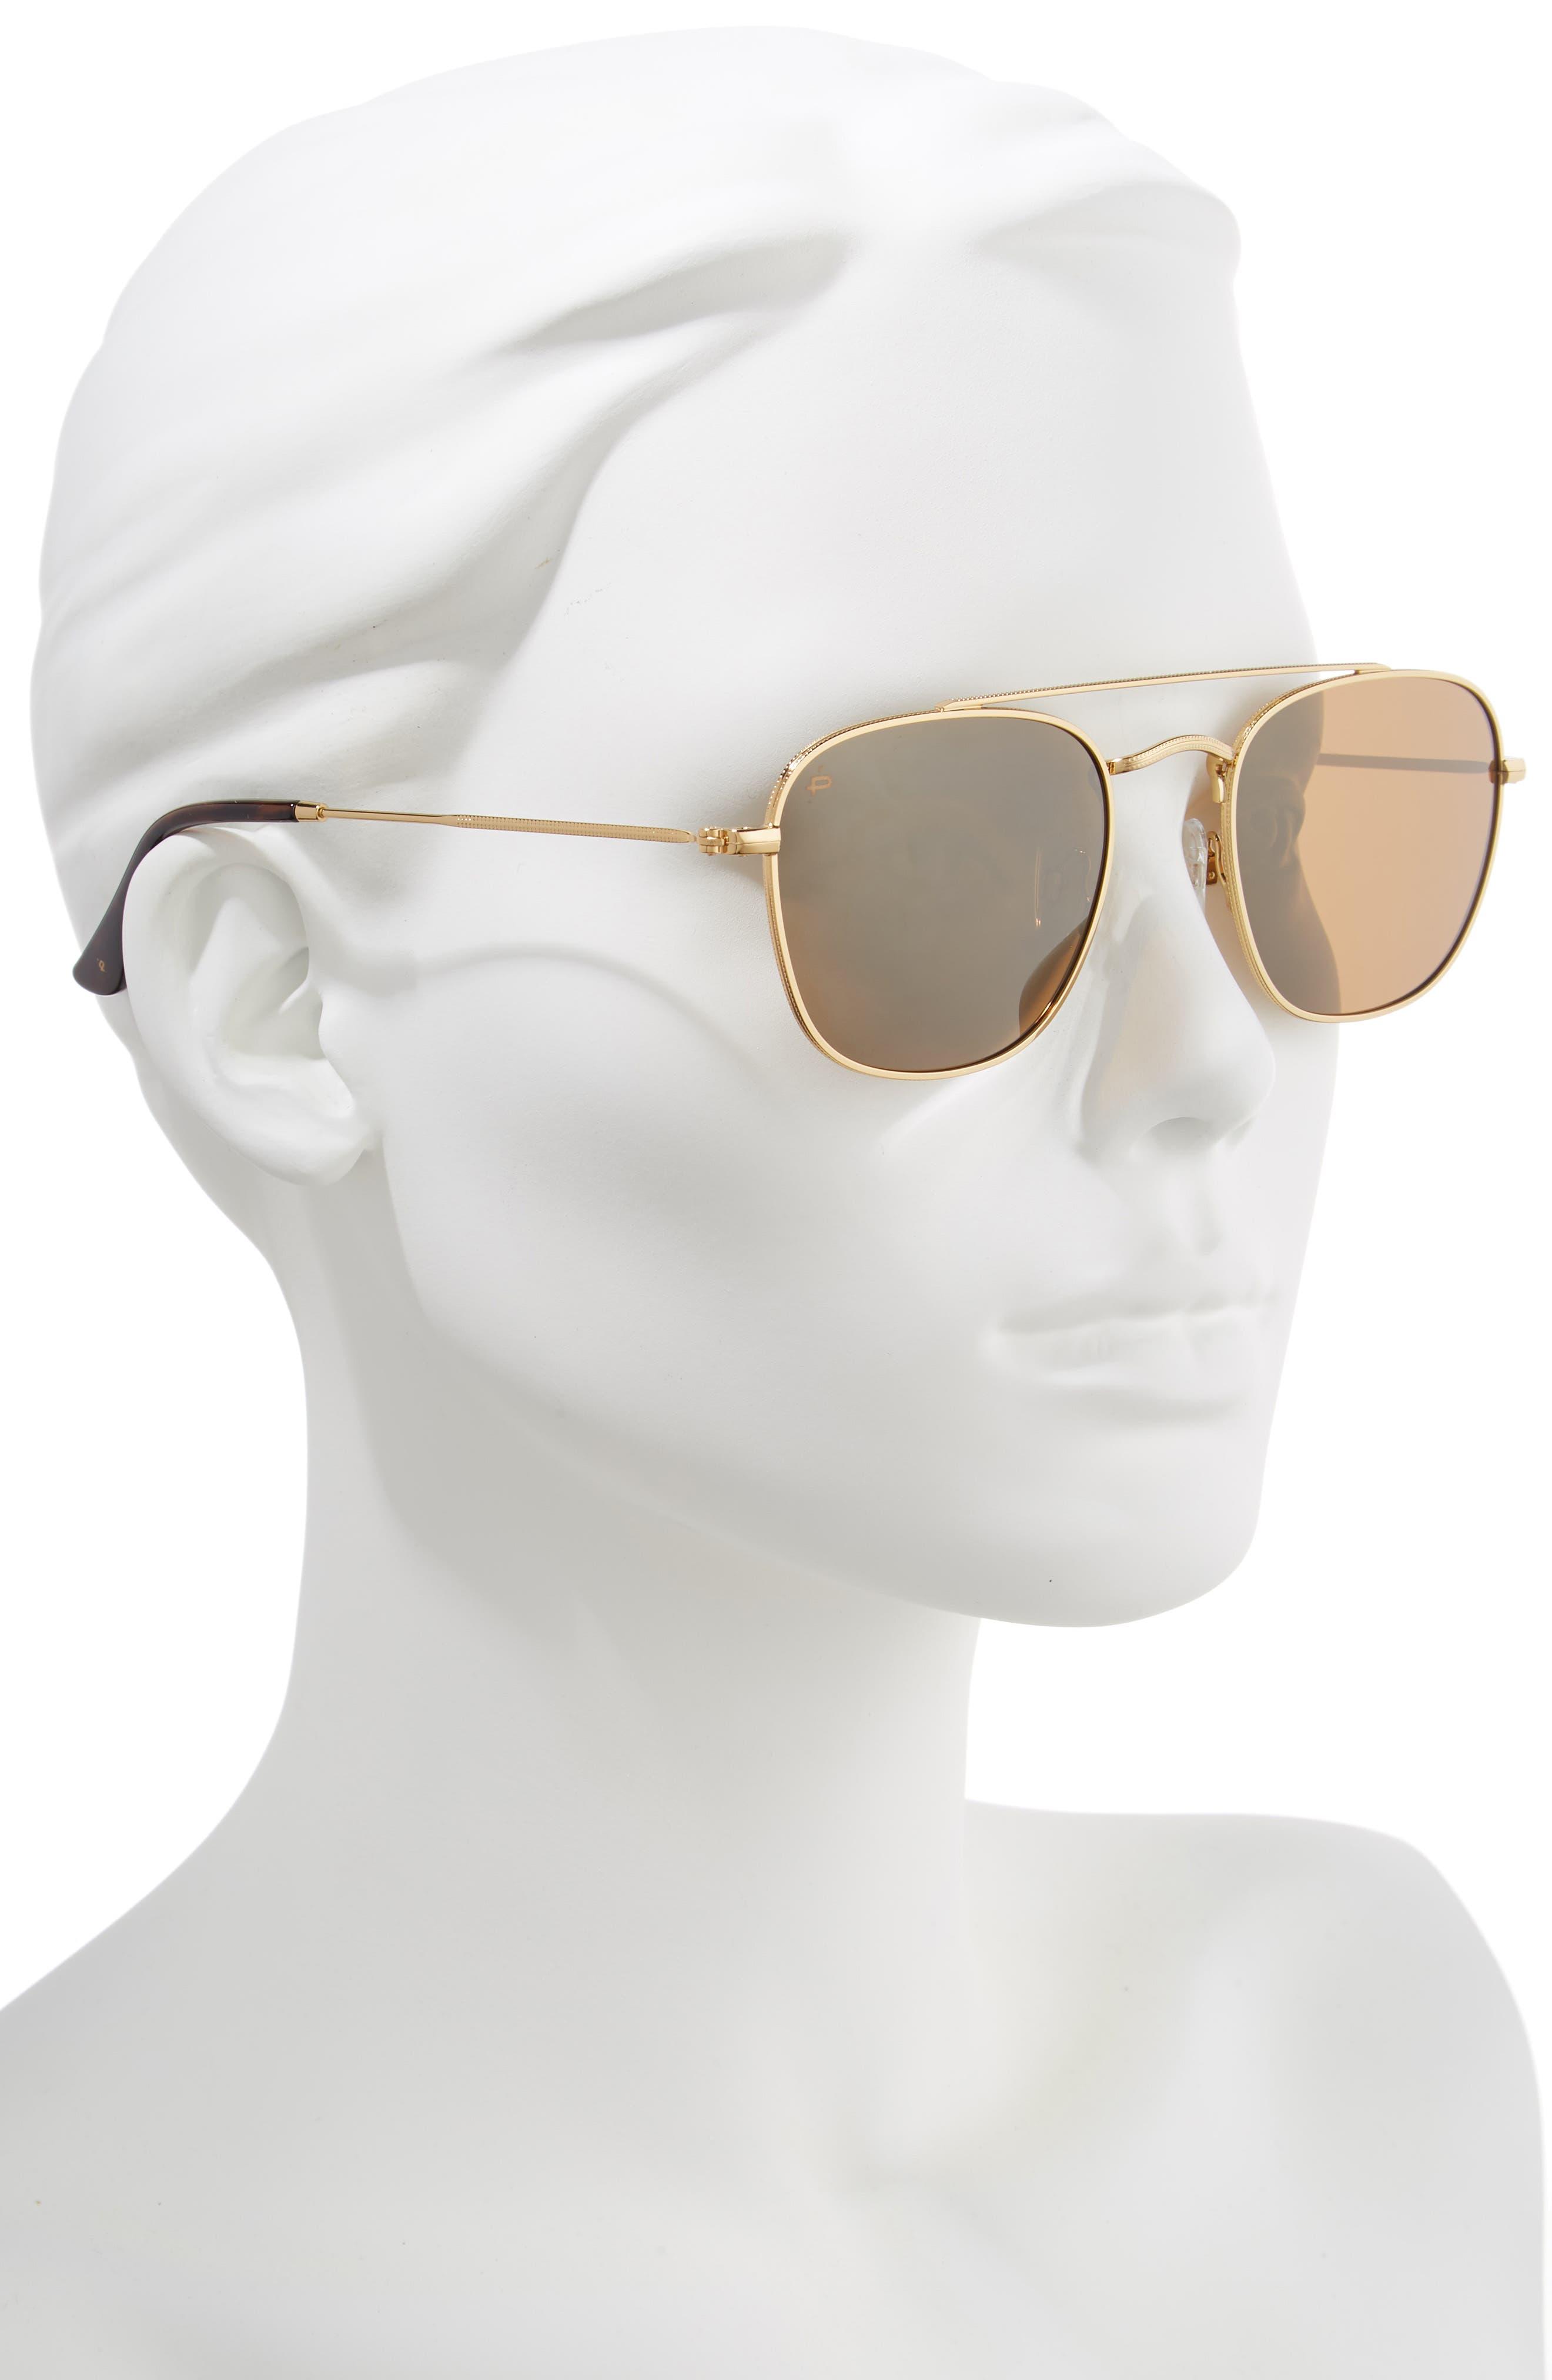 Privé Revaux The Yorker 54mm Sunglasses,                             Alternate thumbnail 2, color,                             HEAVY GOLD